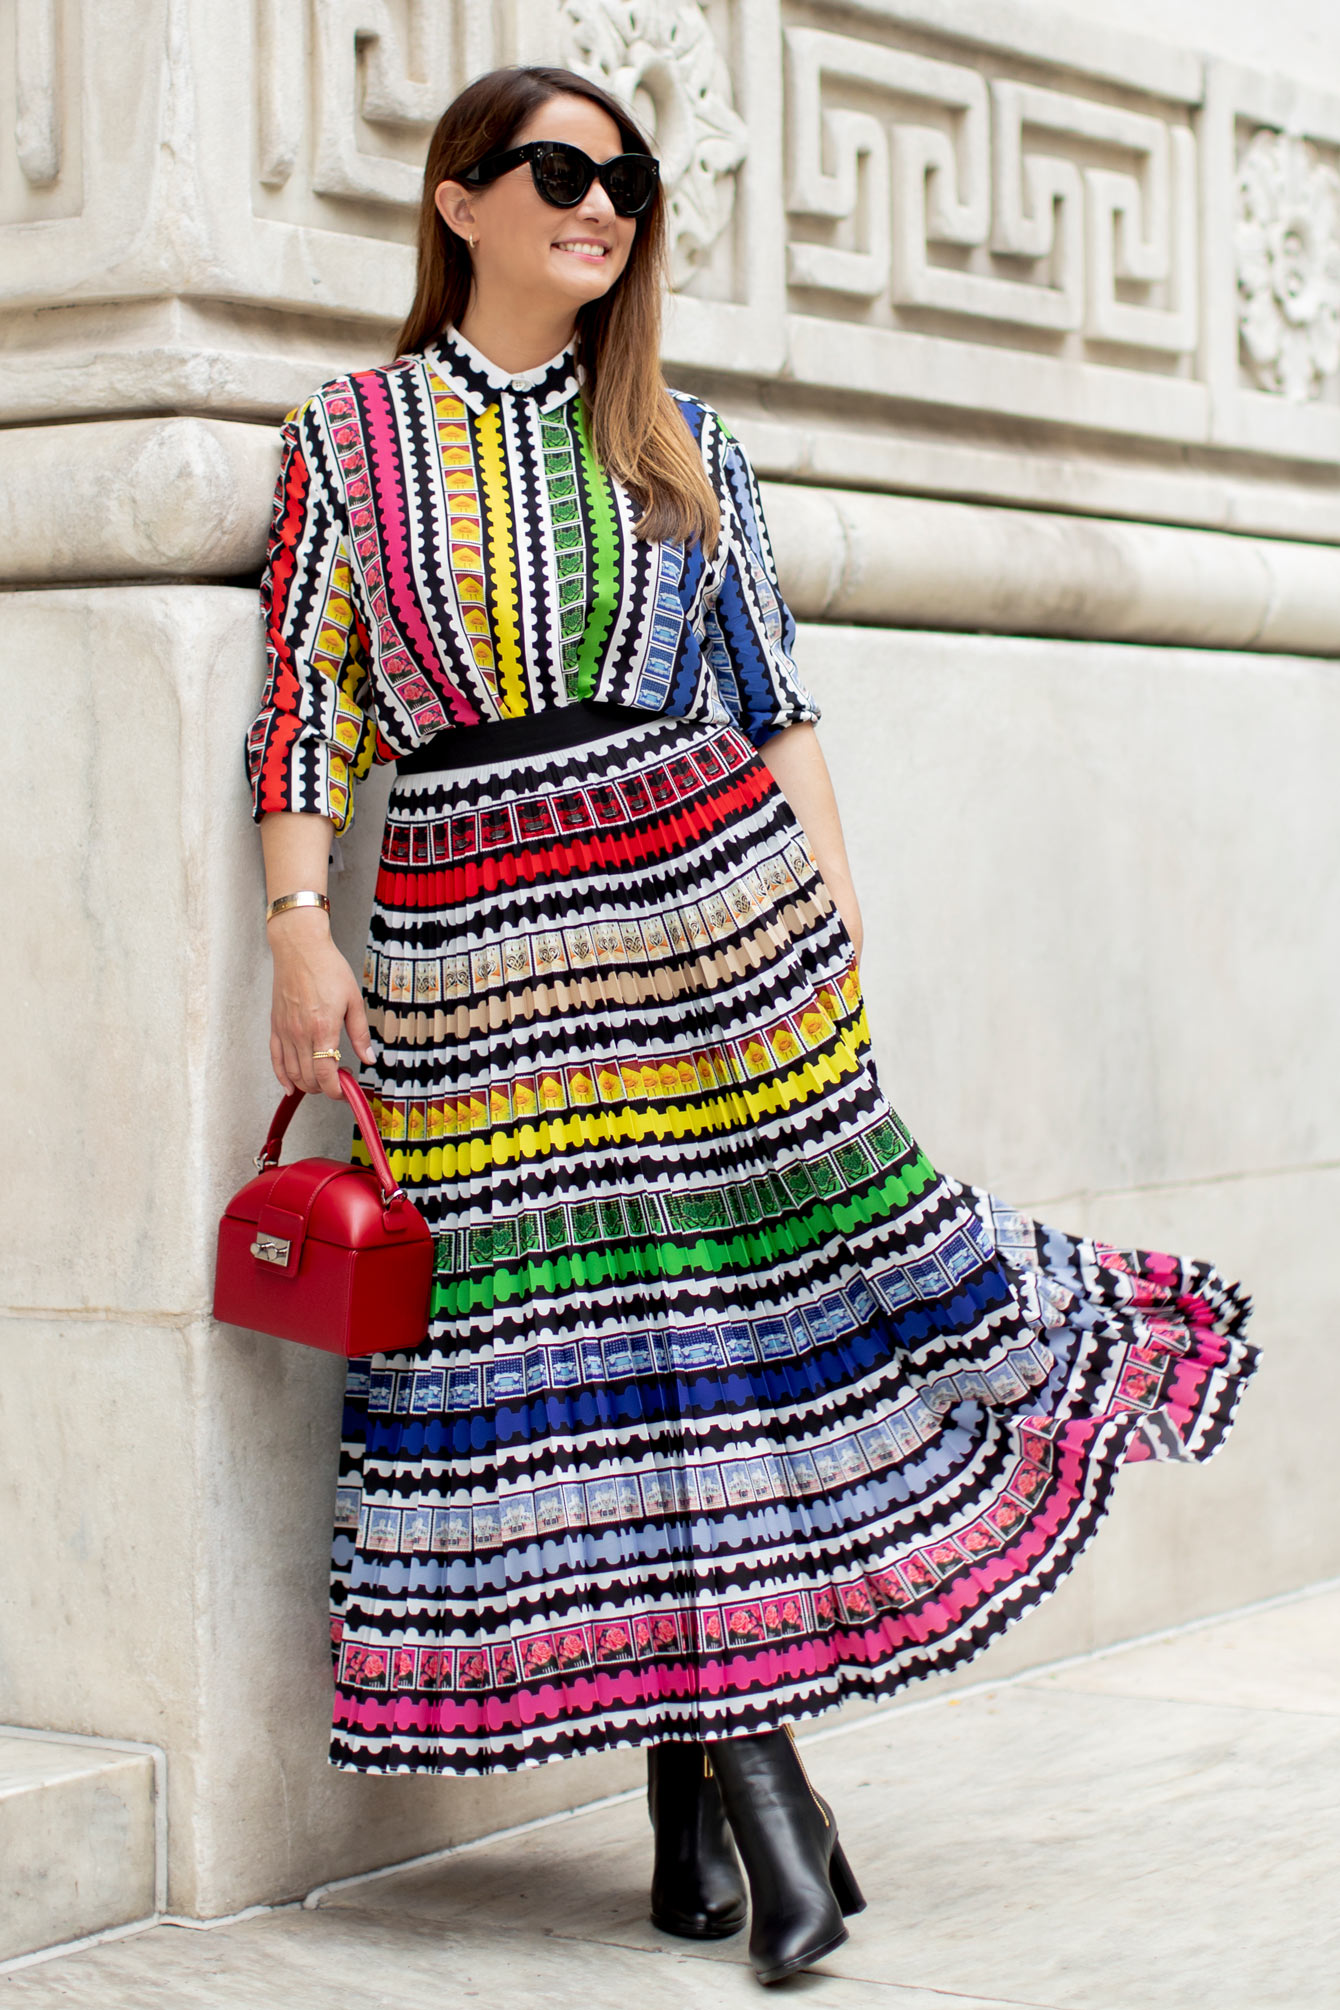 Mary Katrantzou Pleated Skirt